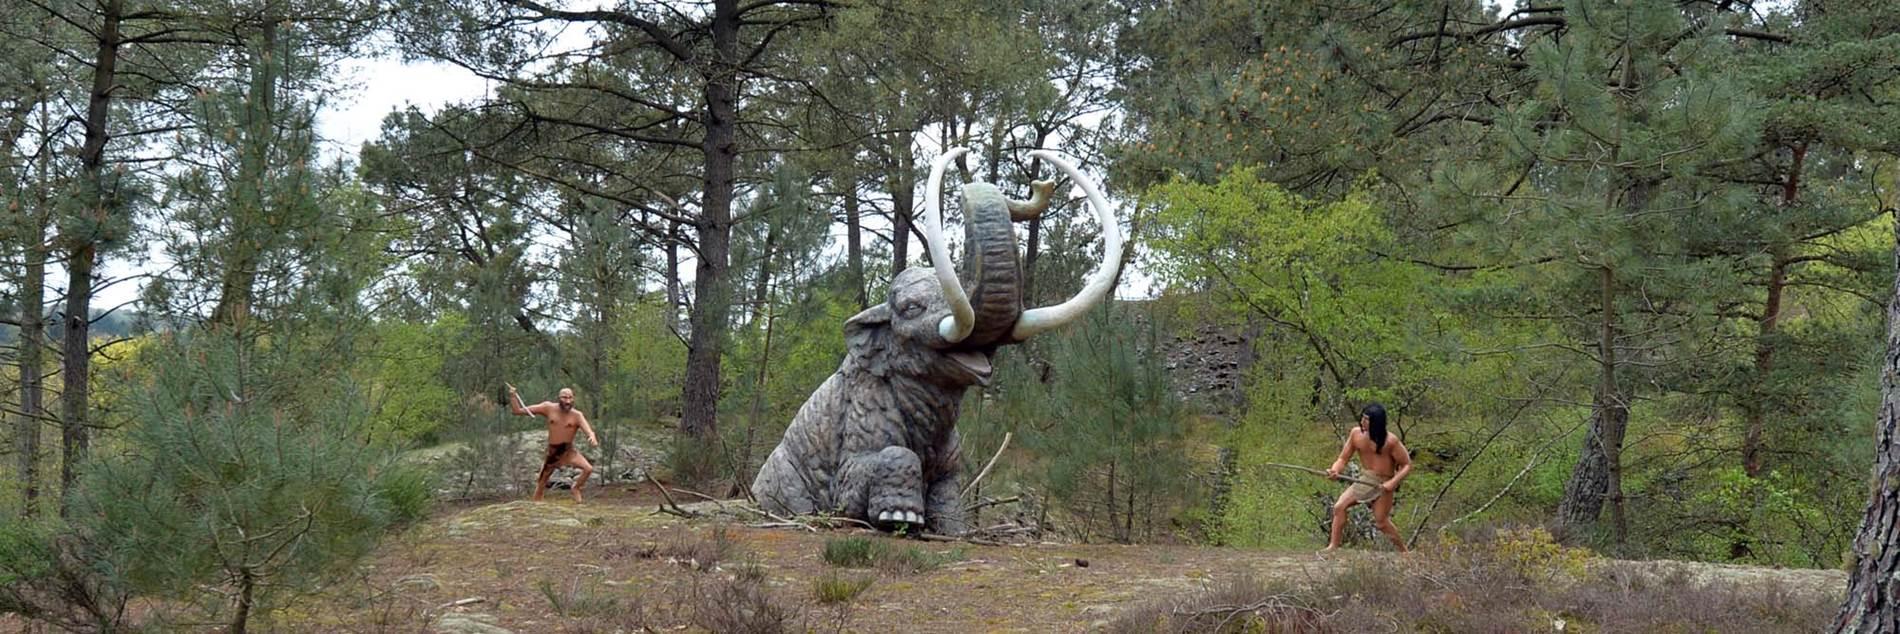 parc de prehistoire de bretagne - malansac - morbihan bretagne sud-05 © Michel RENAC